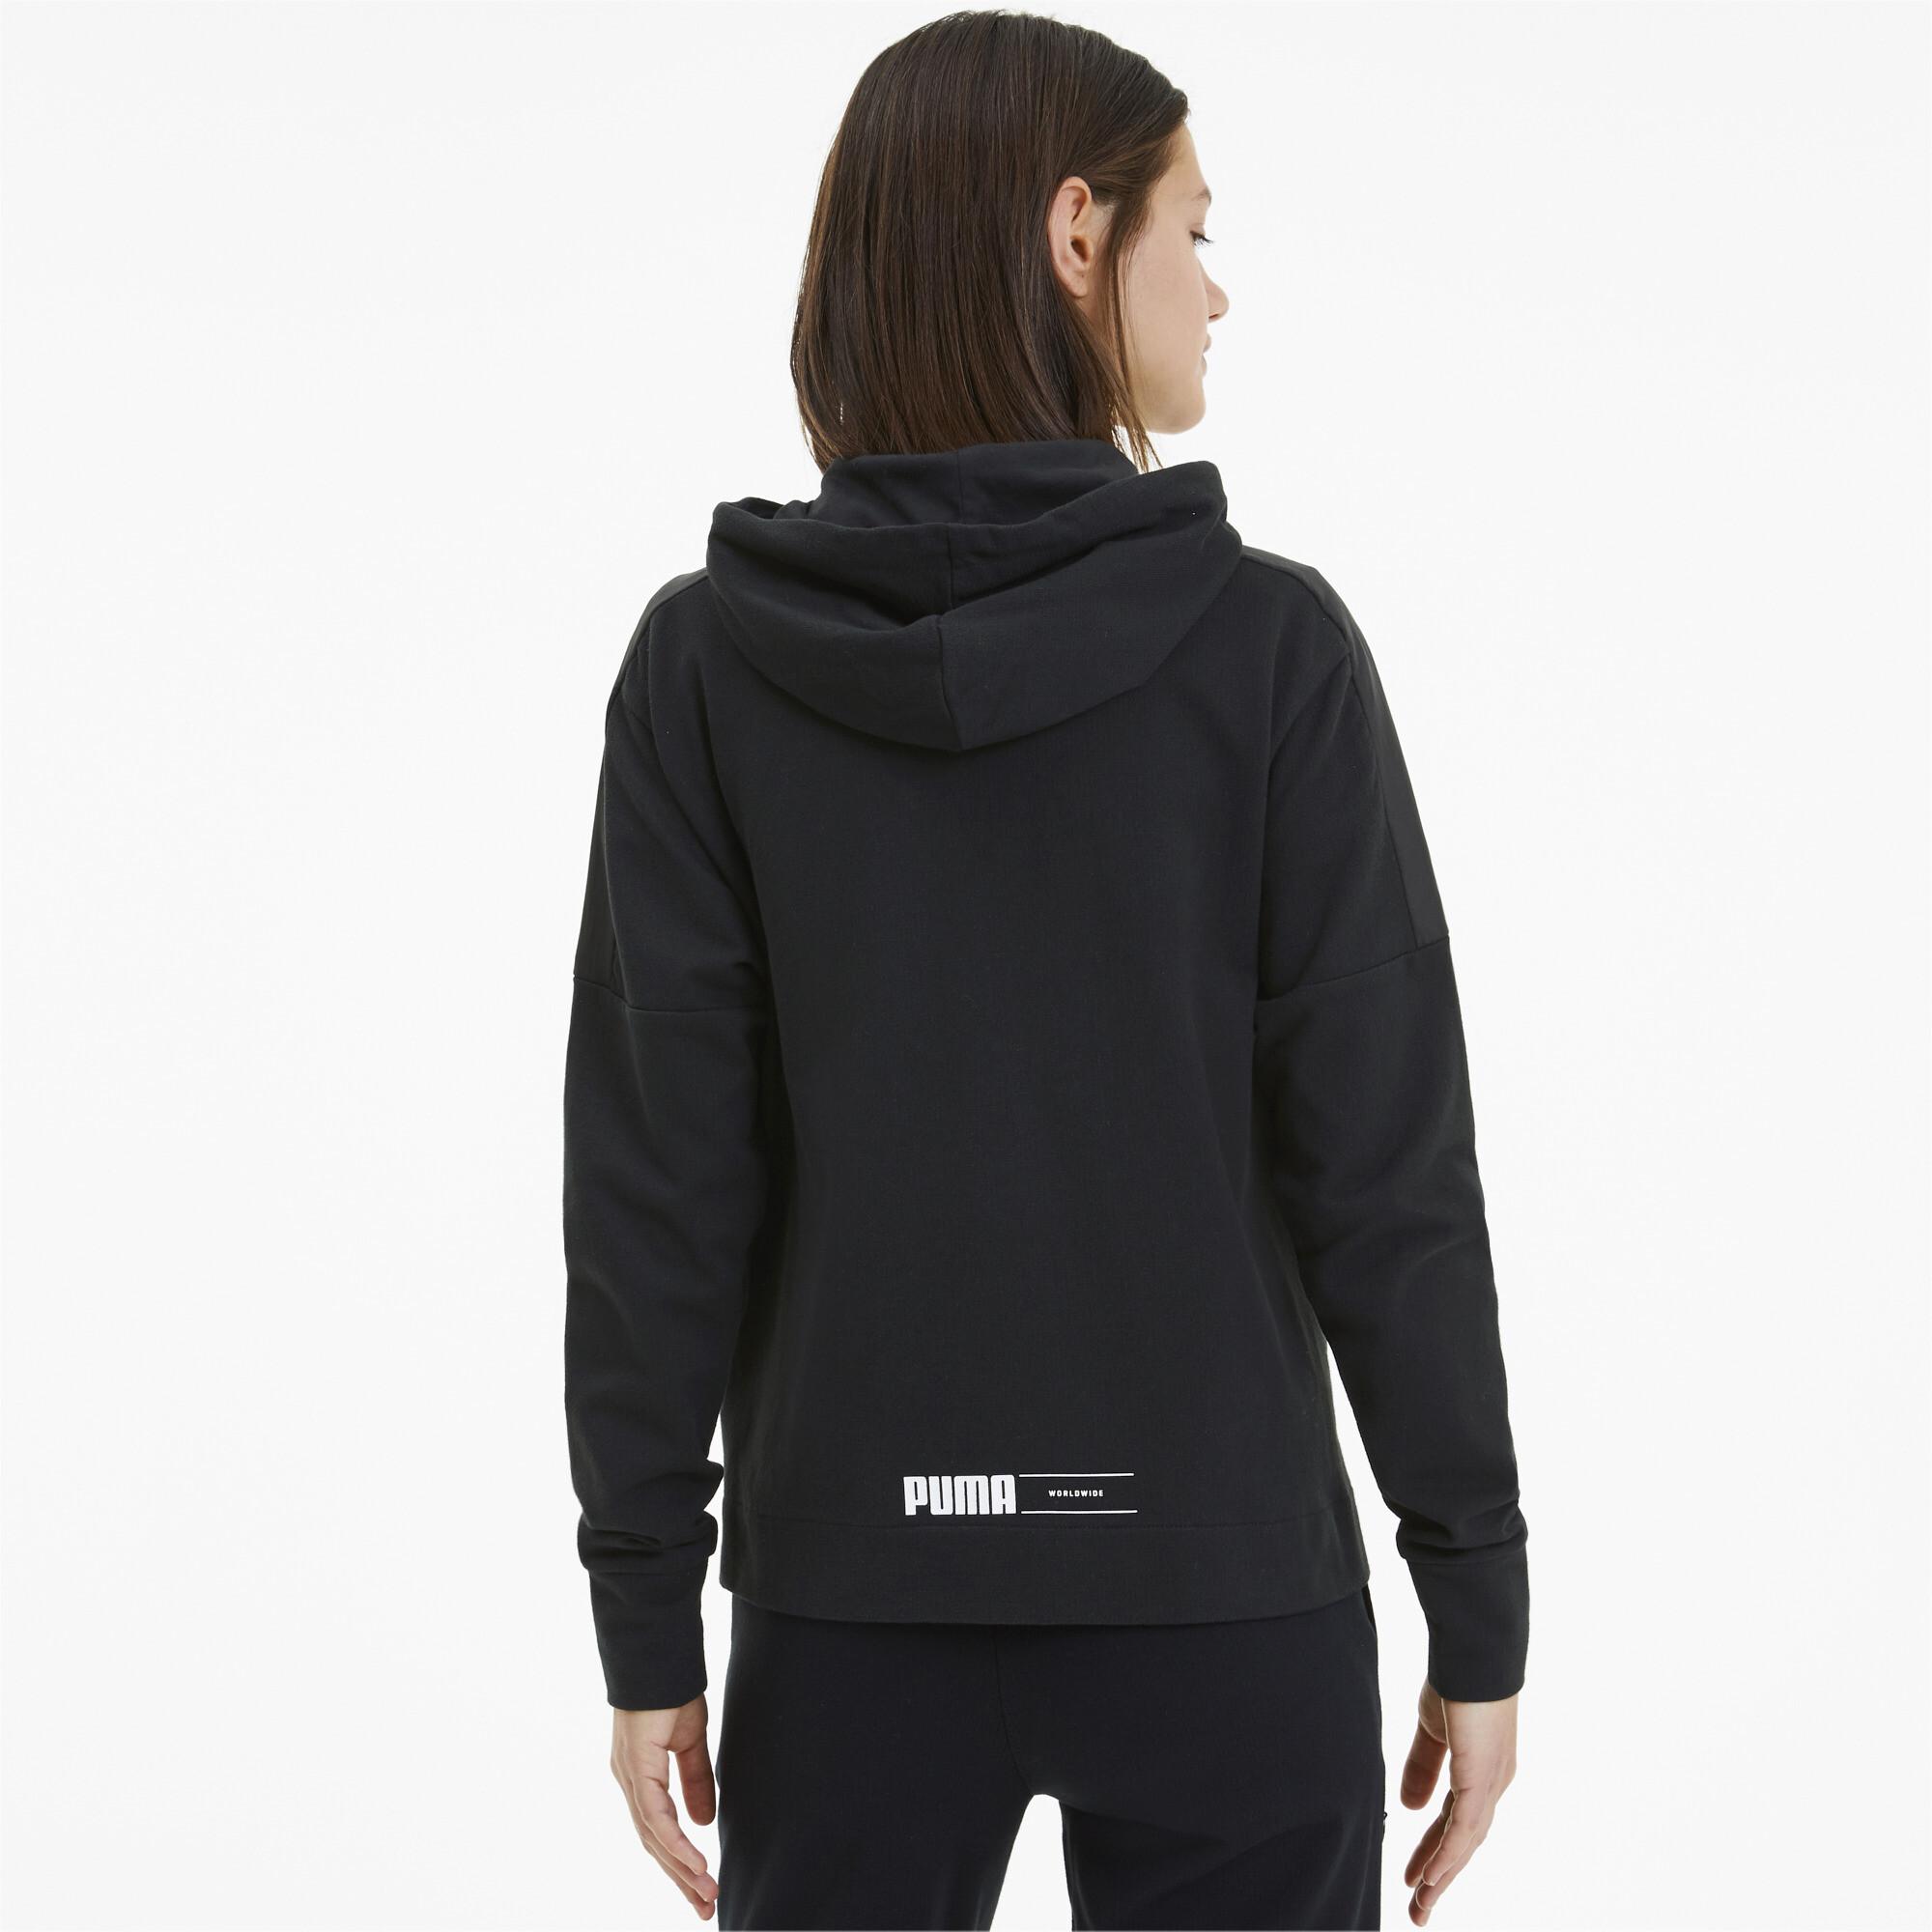 PUMA-NU-TILITY-Women-039-s-Full-Zip-Hoodie-Women-Sweat-Basics miniatuur 10